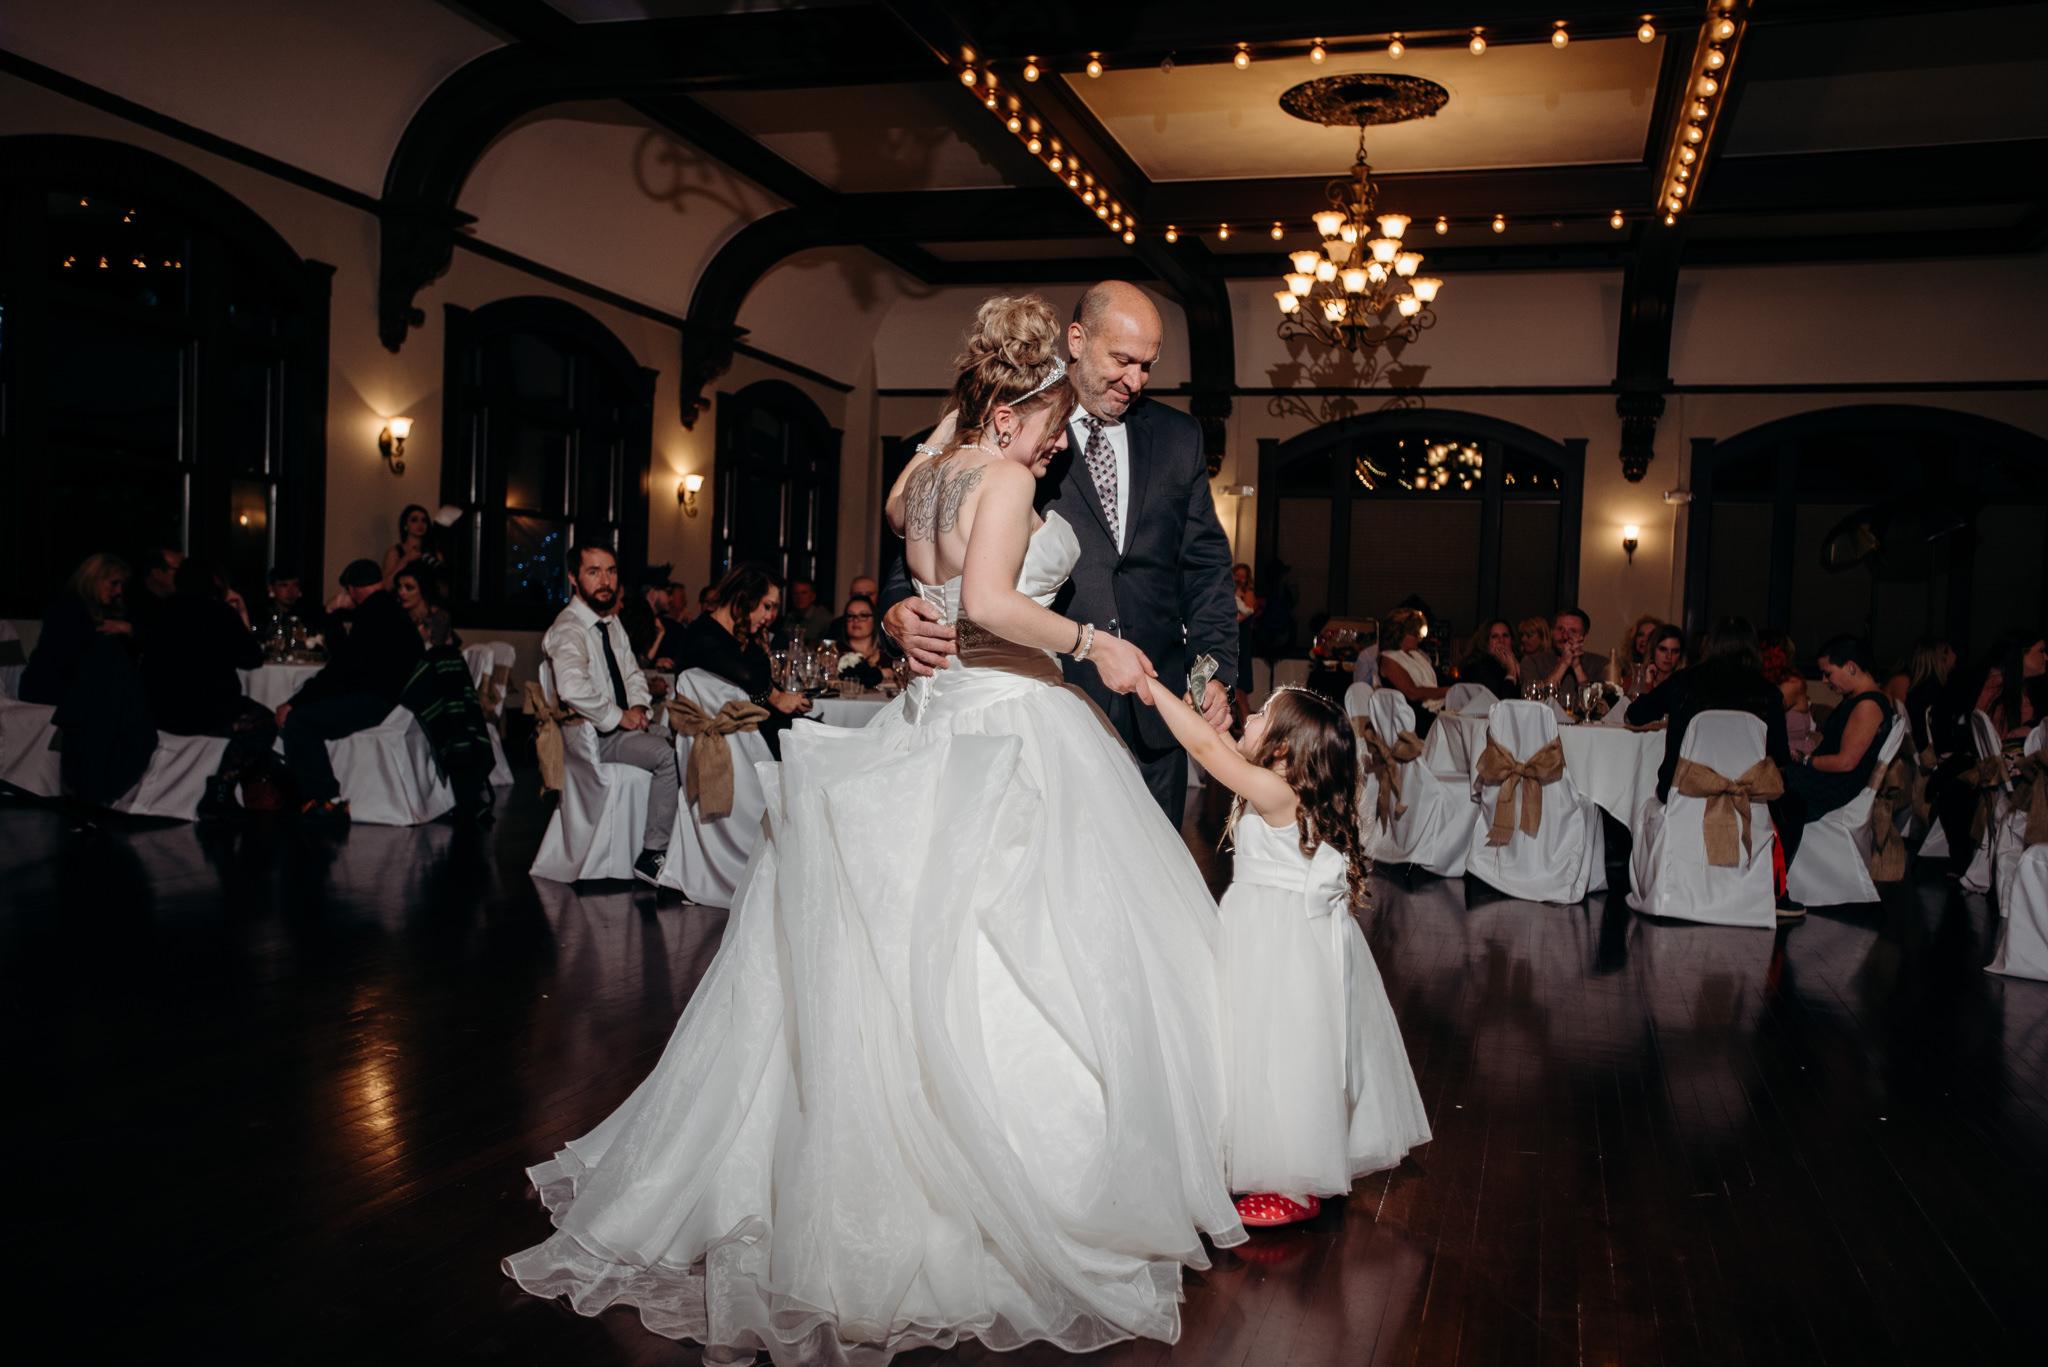 Grant Beachy Photo portrait wedding goshen elkhart south bend chicago-053.jpg